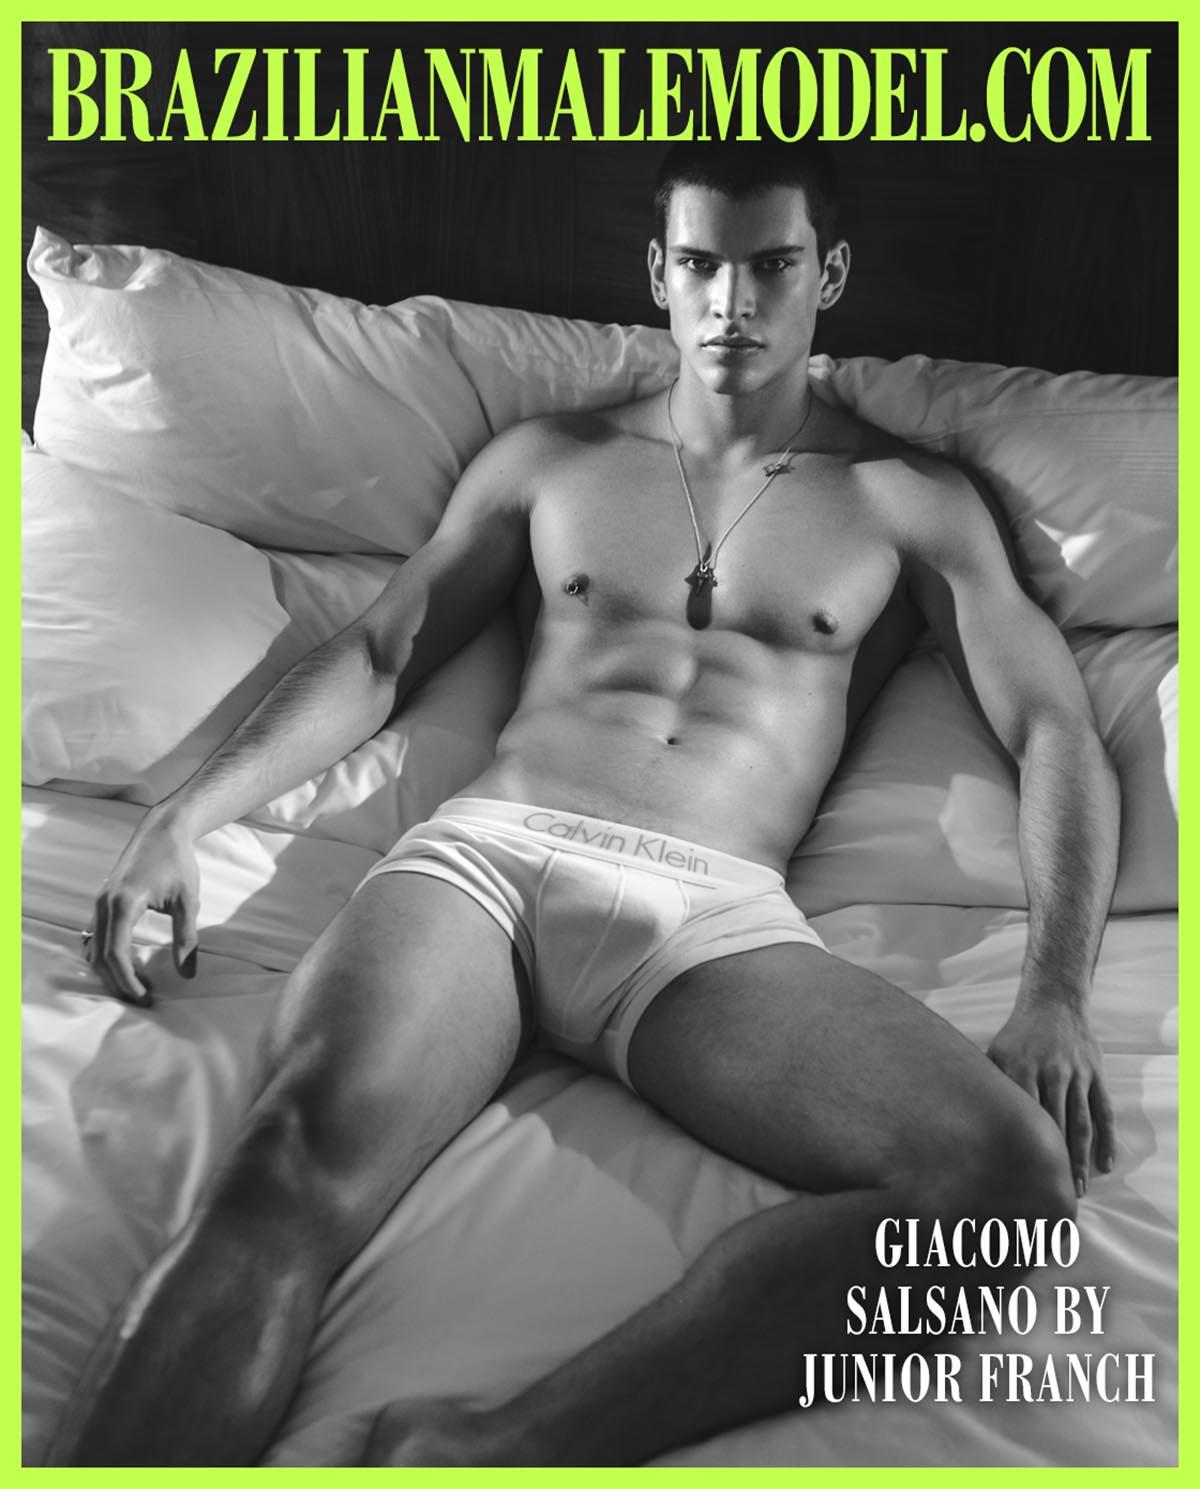 Giacomo Salsano X Junior Franch X Brazilian Male Model X YUP MAGAZINE